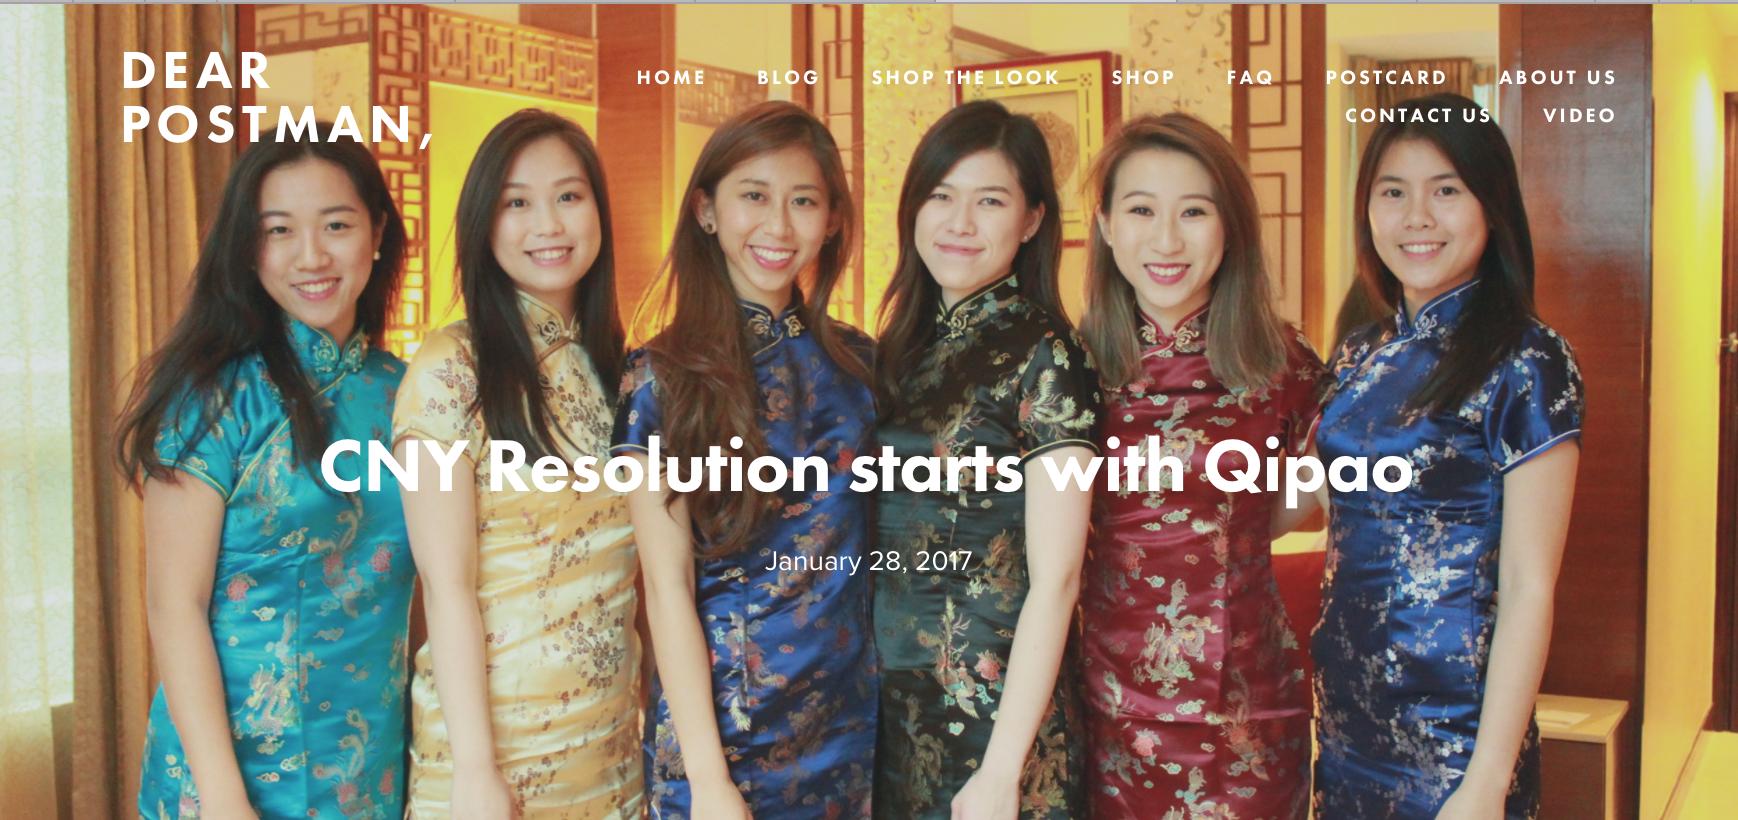 CNY Resolution starts with Qipao